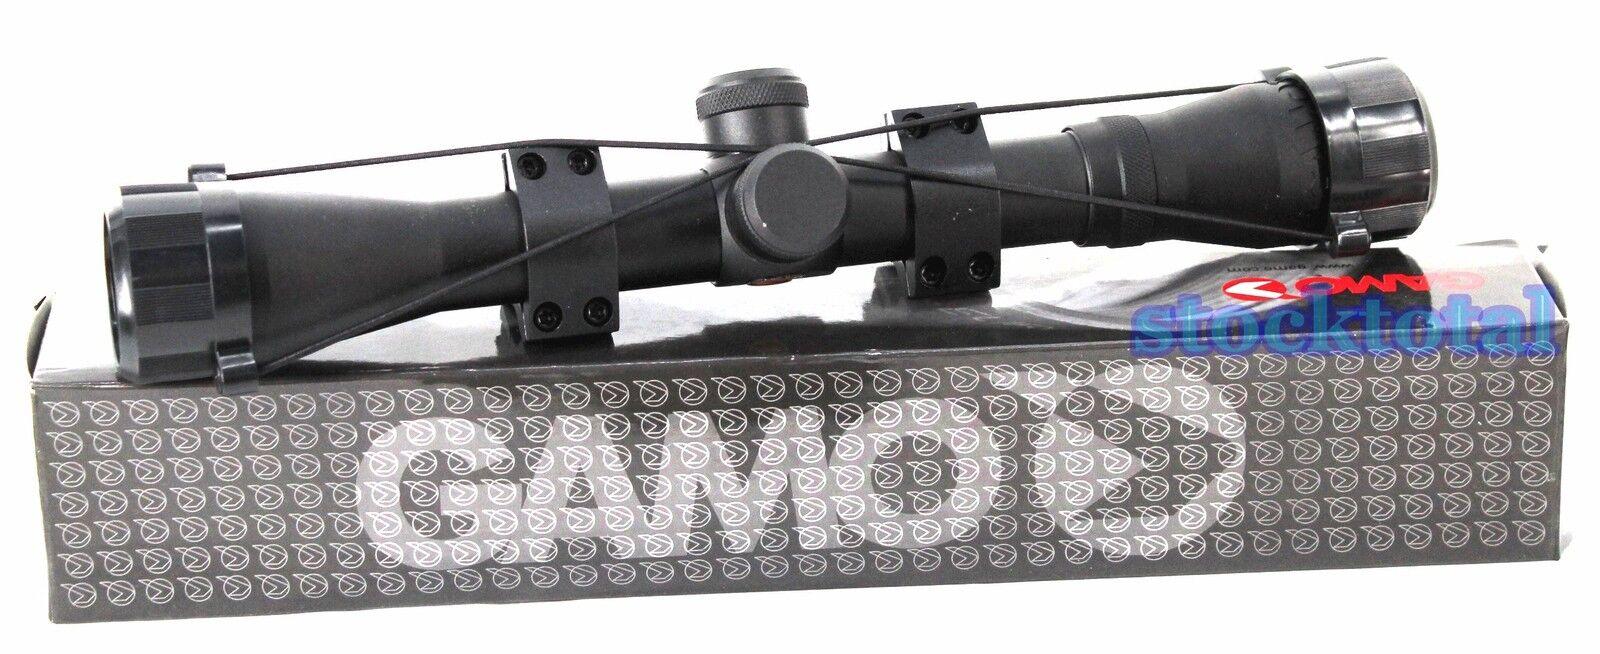 Visor Telescópico 1  4x32 WR Serie Sporter Gamo VIEWFINDER VE4X32WR G